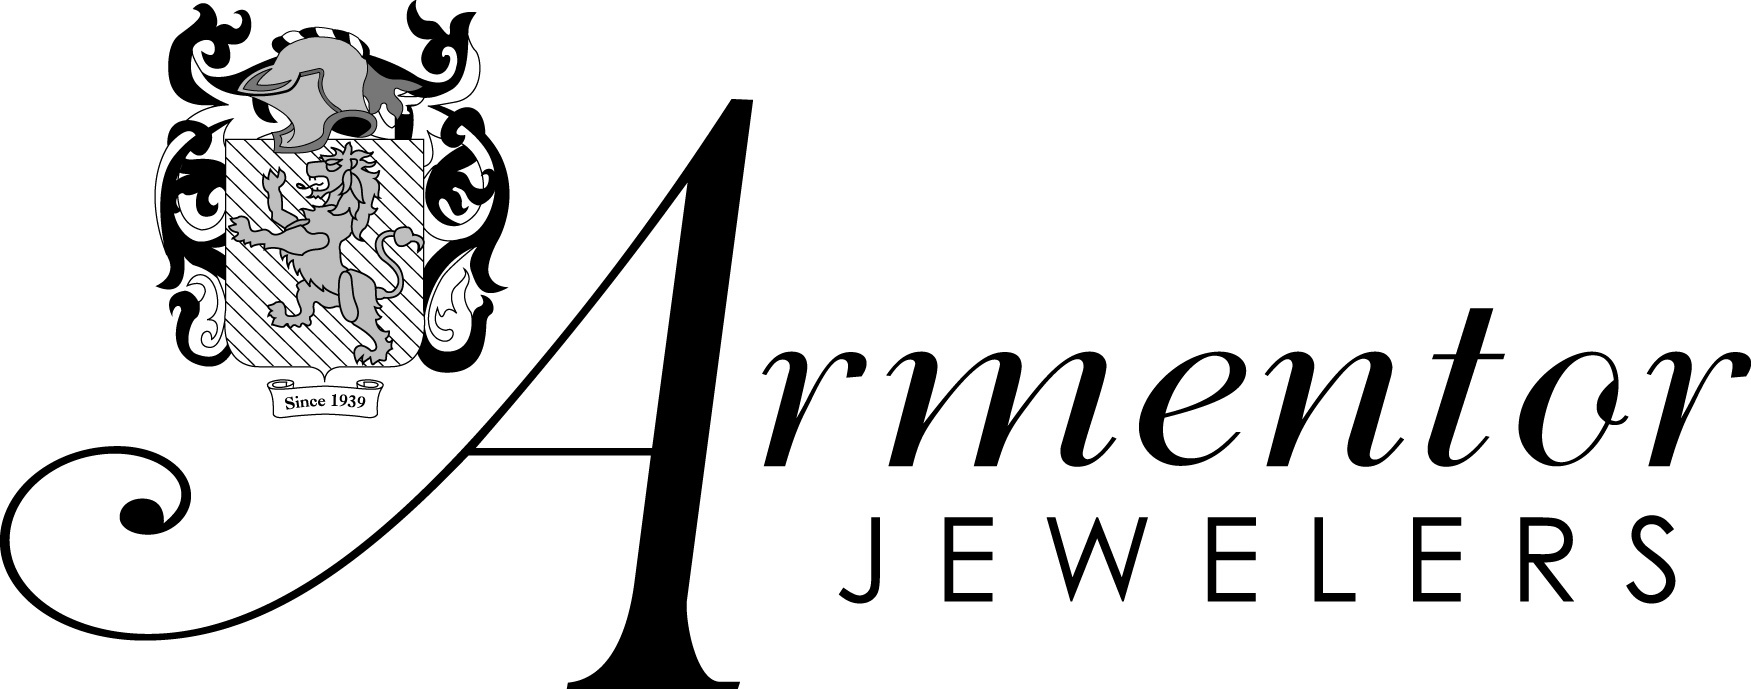 Armentor Jewelers logo